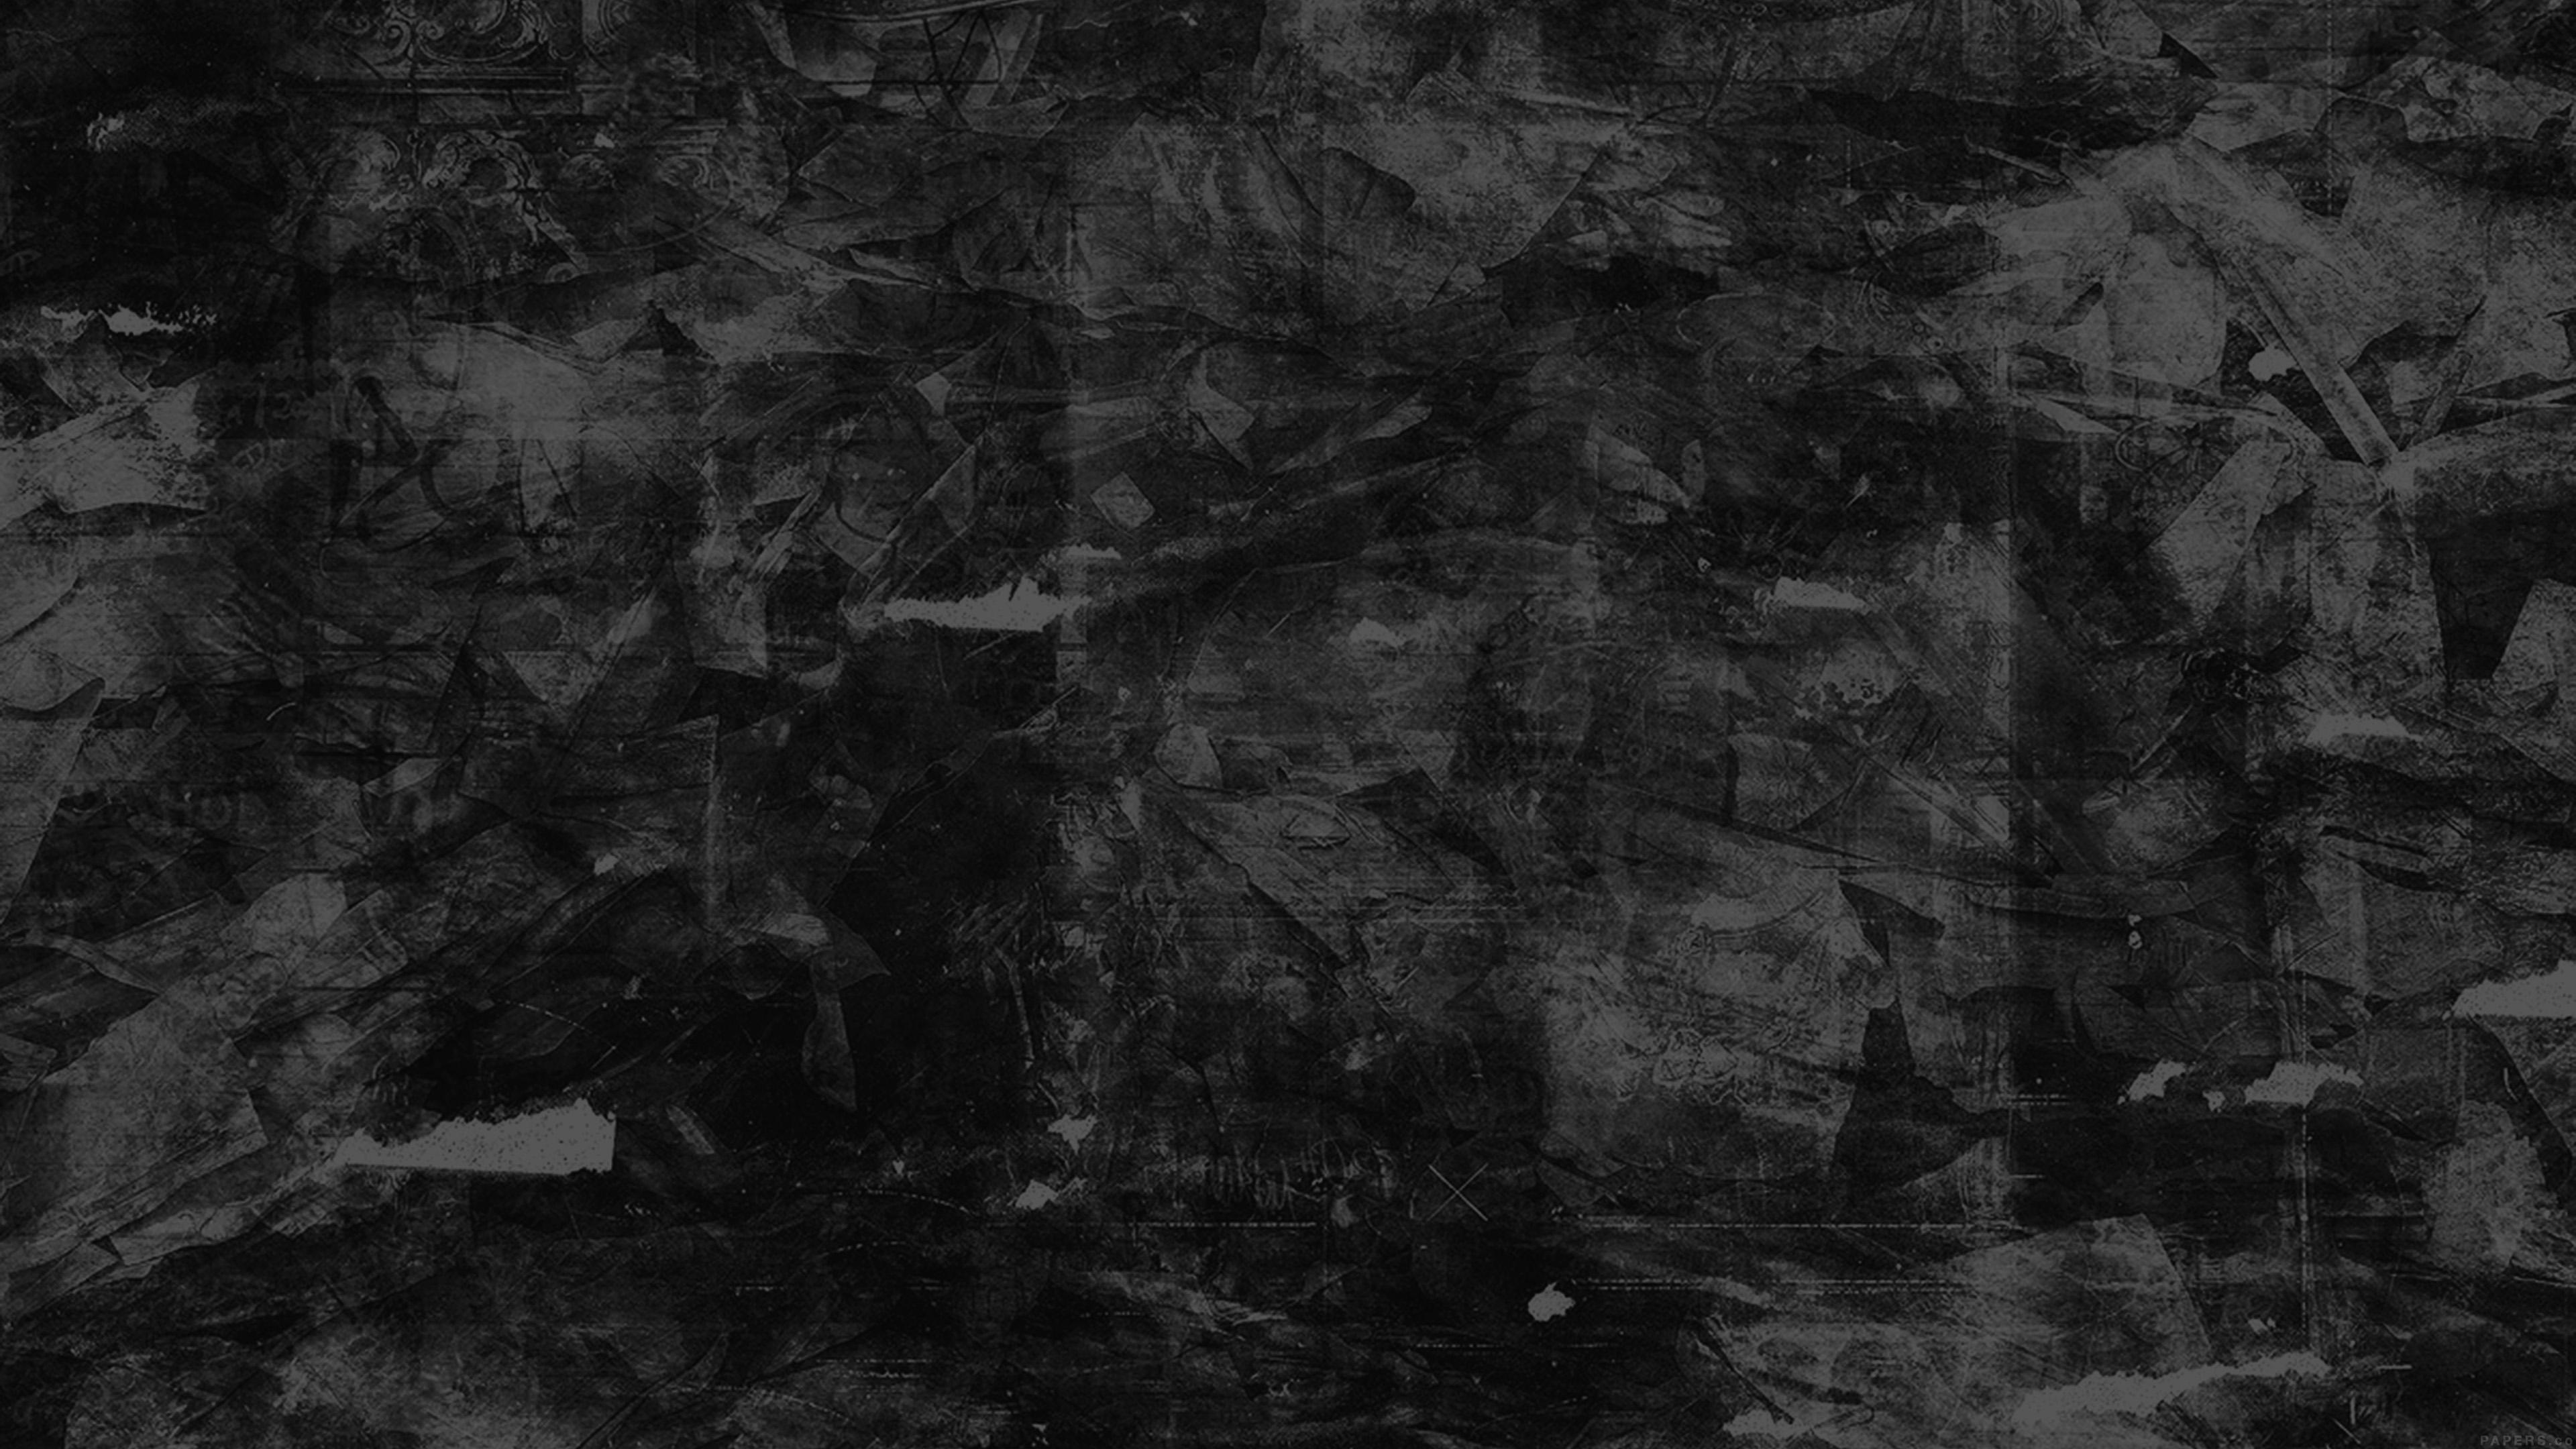 Wallpaper For Desktop Laptop Al33 Wonder Lust Art Illust Grunge